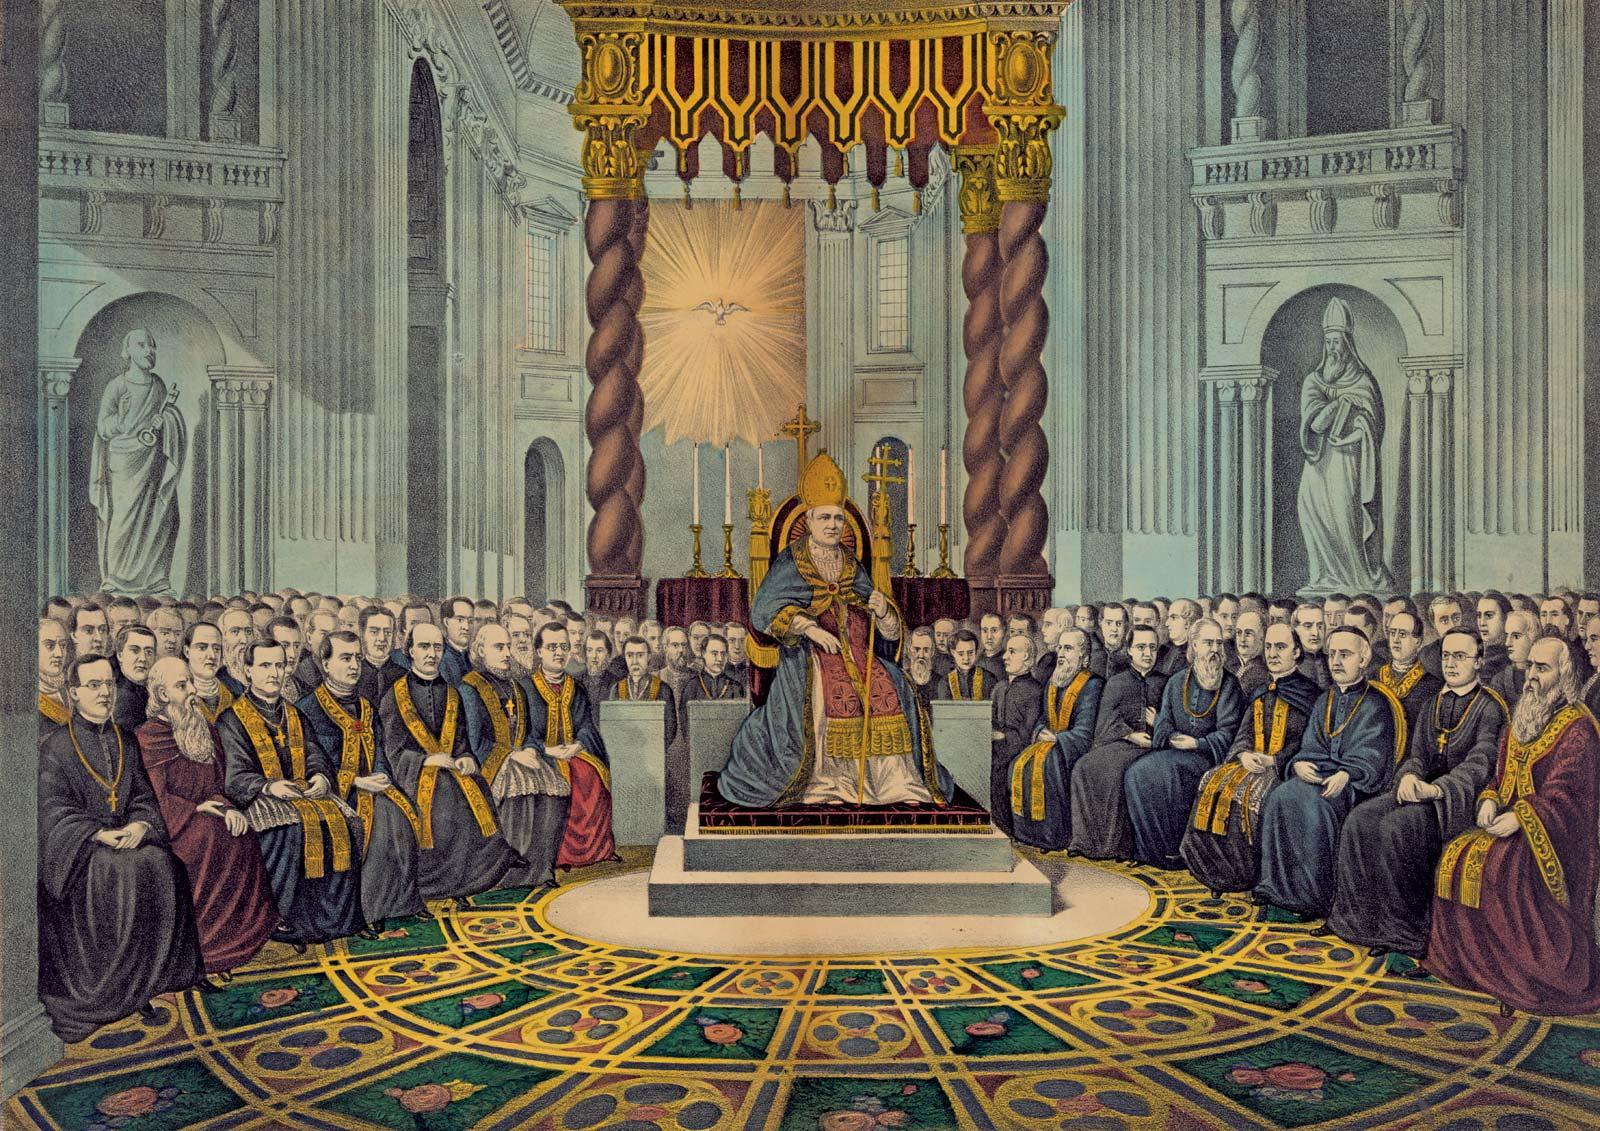 Pius-IX-First-Vatican-Council-December-8-1869 – part